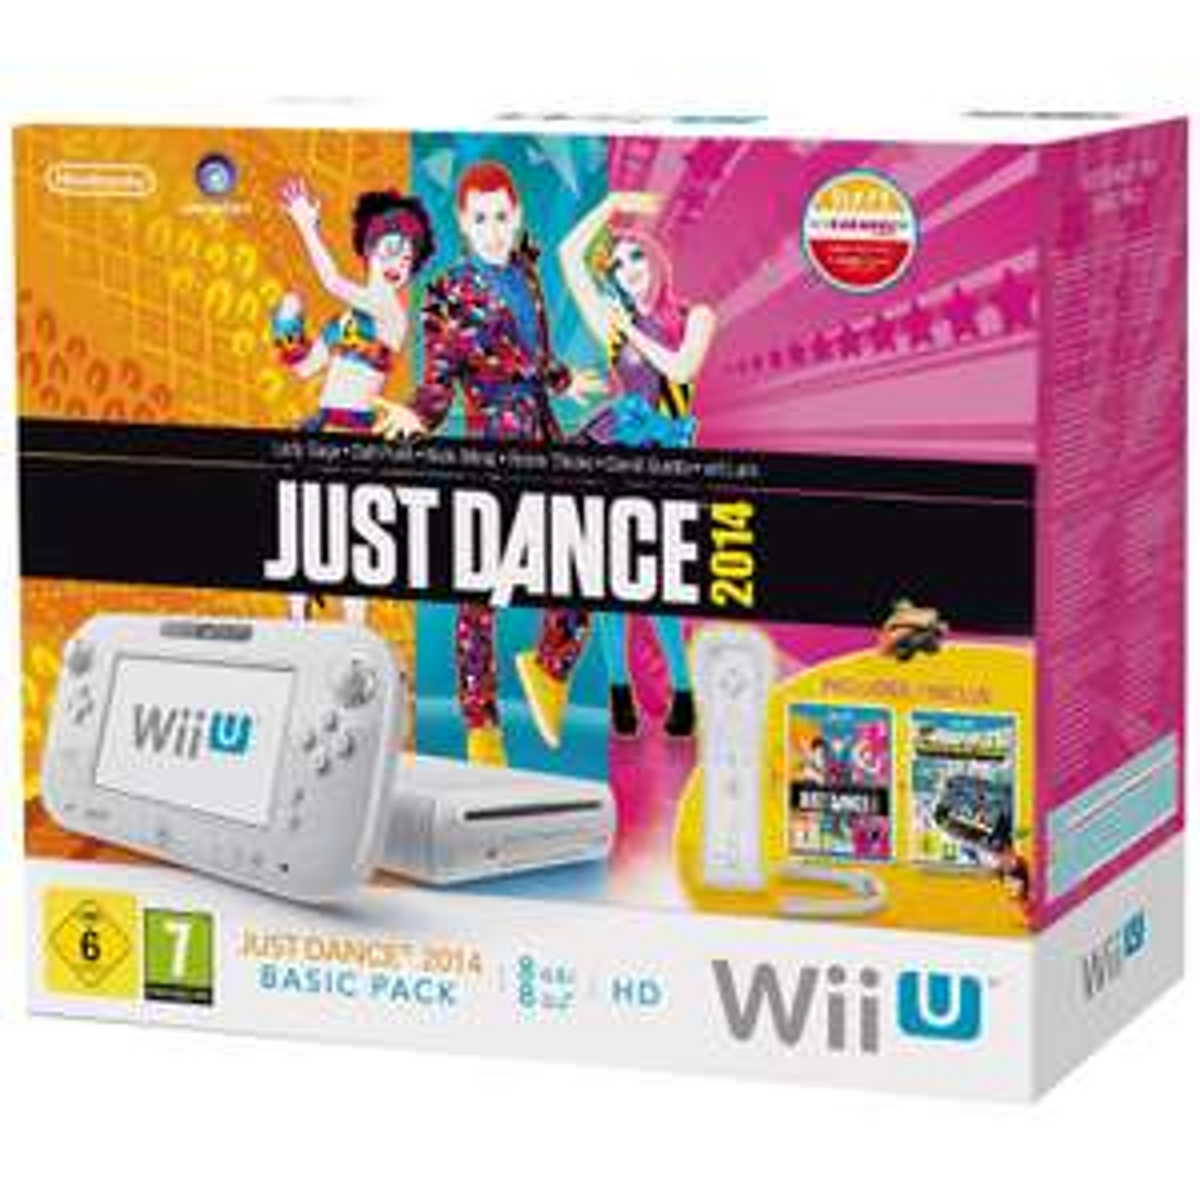 Console Nintendo Wii U 8Go + Wiimote + Just dance 2014 + Nintendo Land